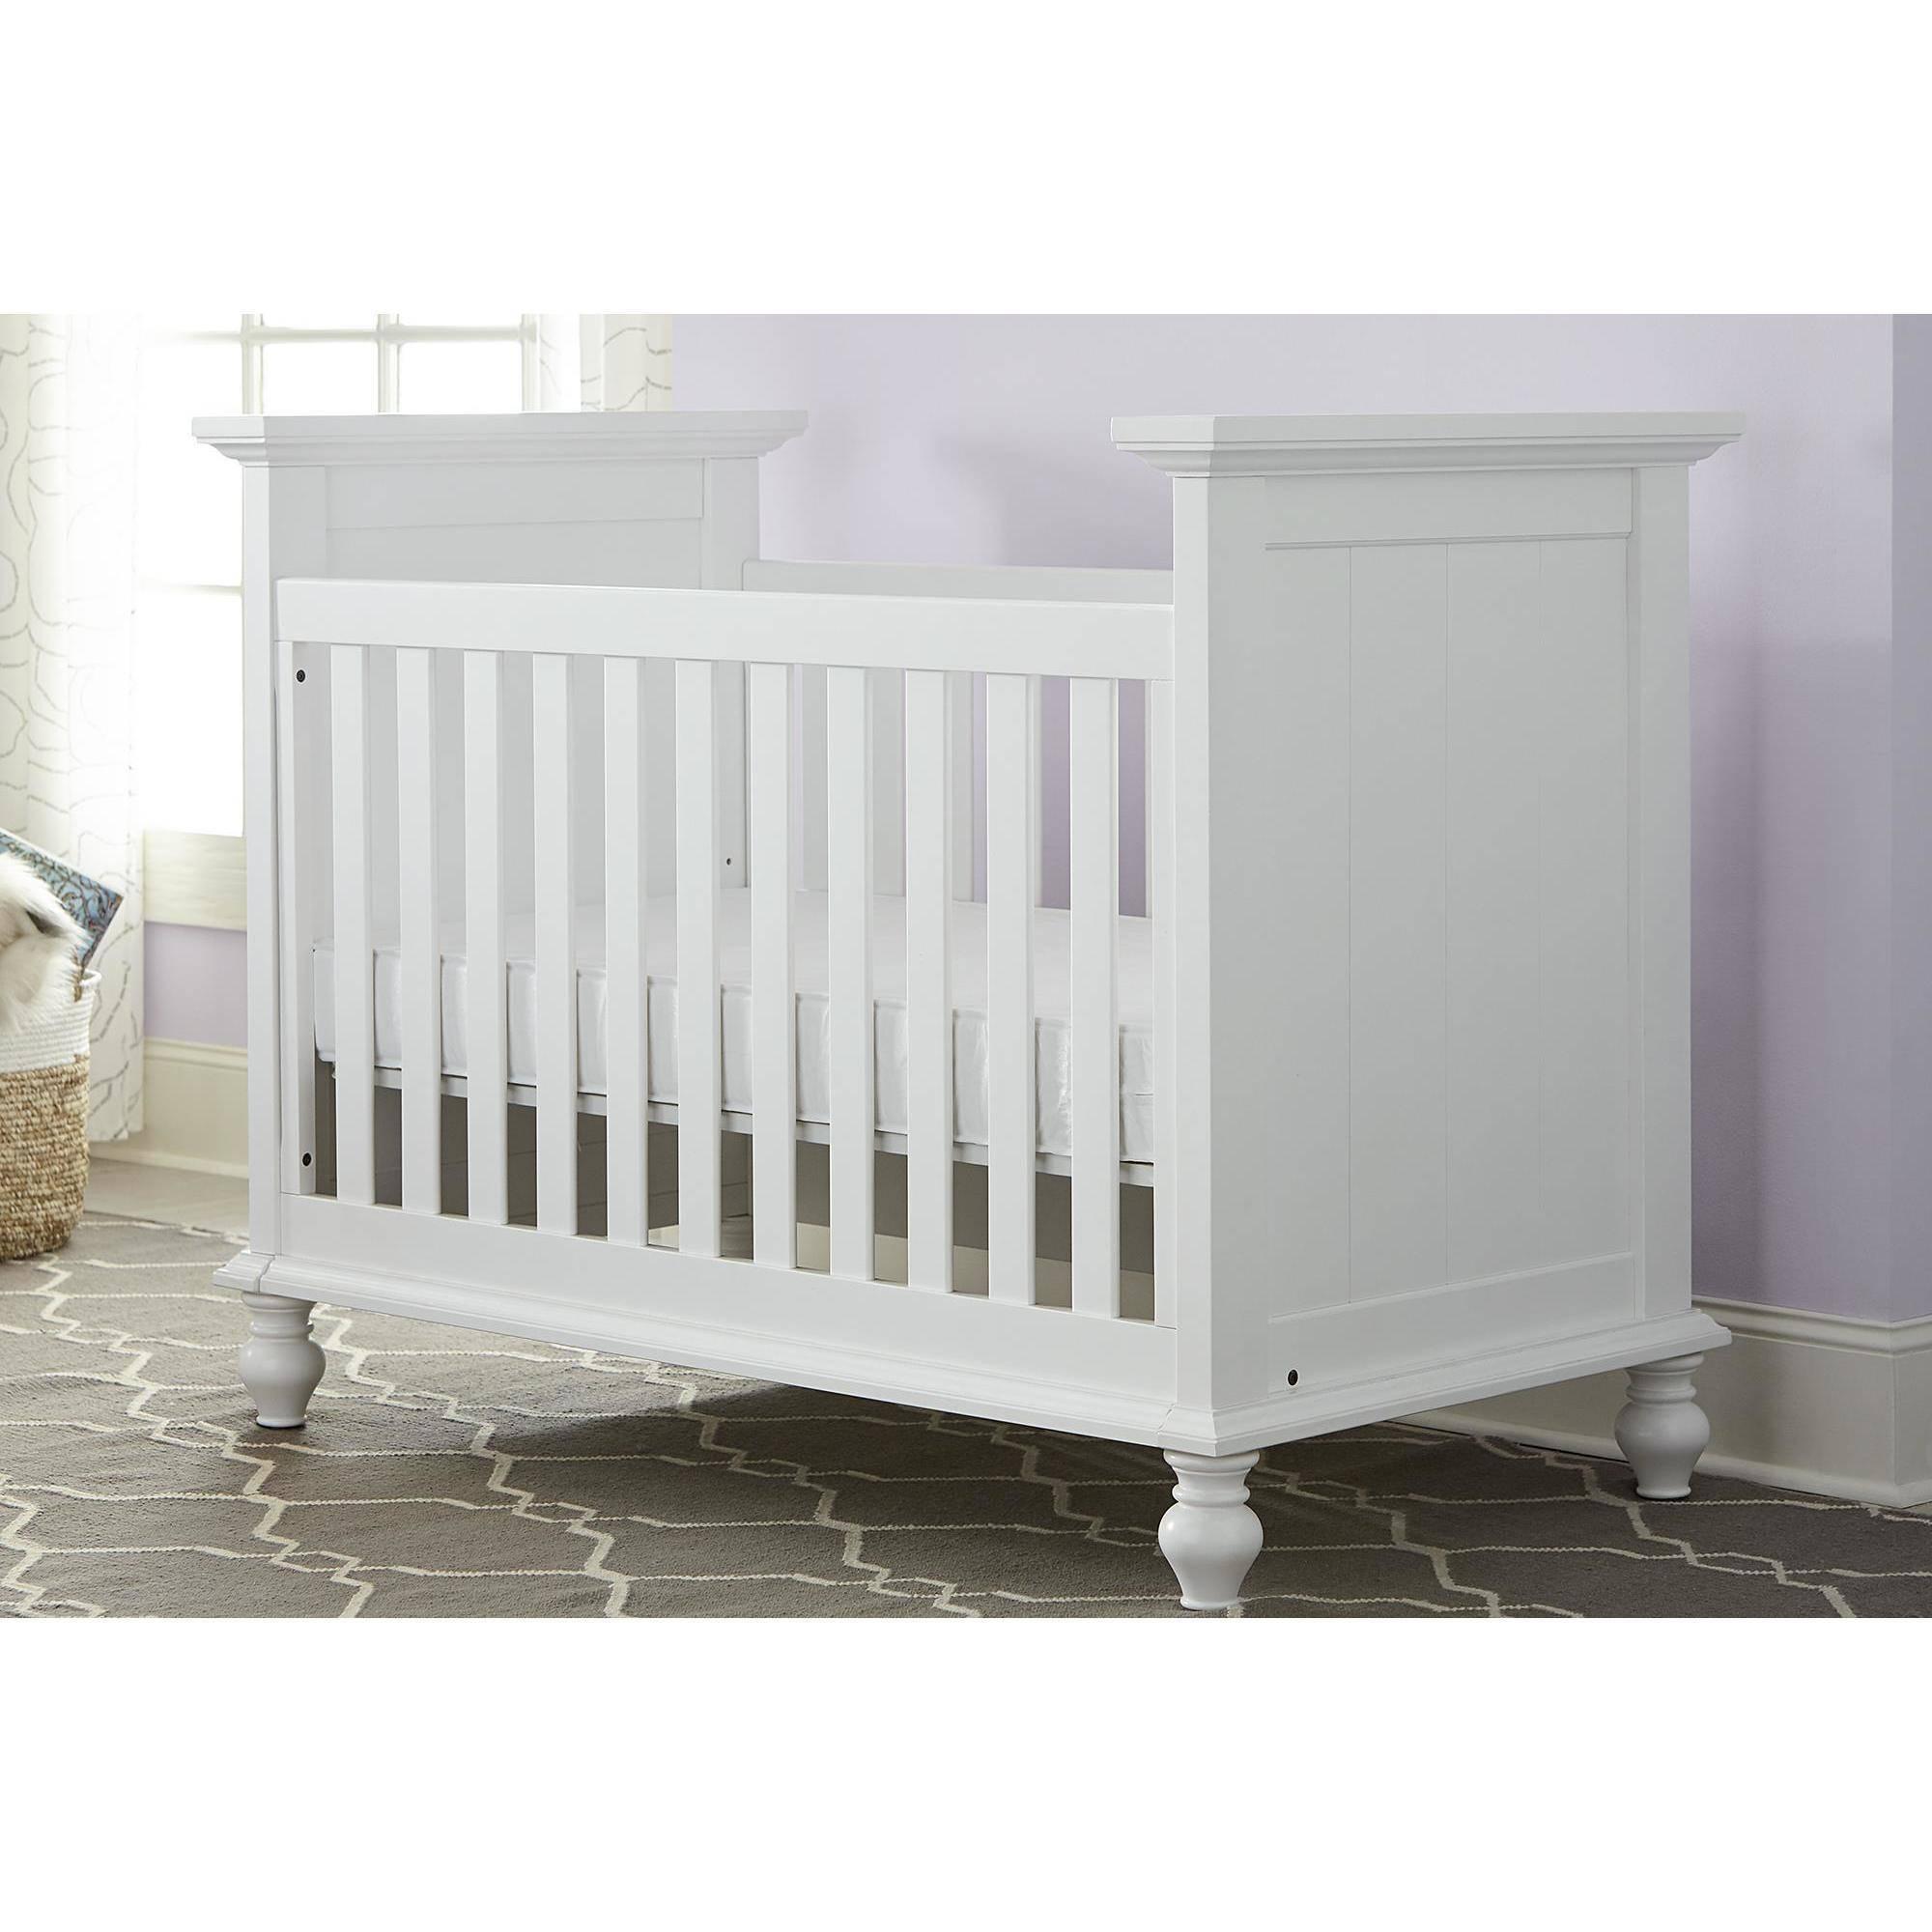 Safest brand of crib for babies - Safest Brand Of Crib For Babies 25